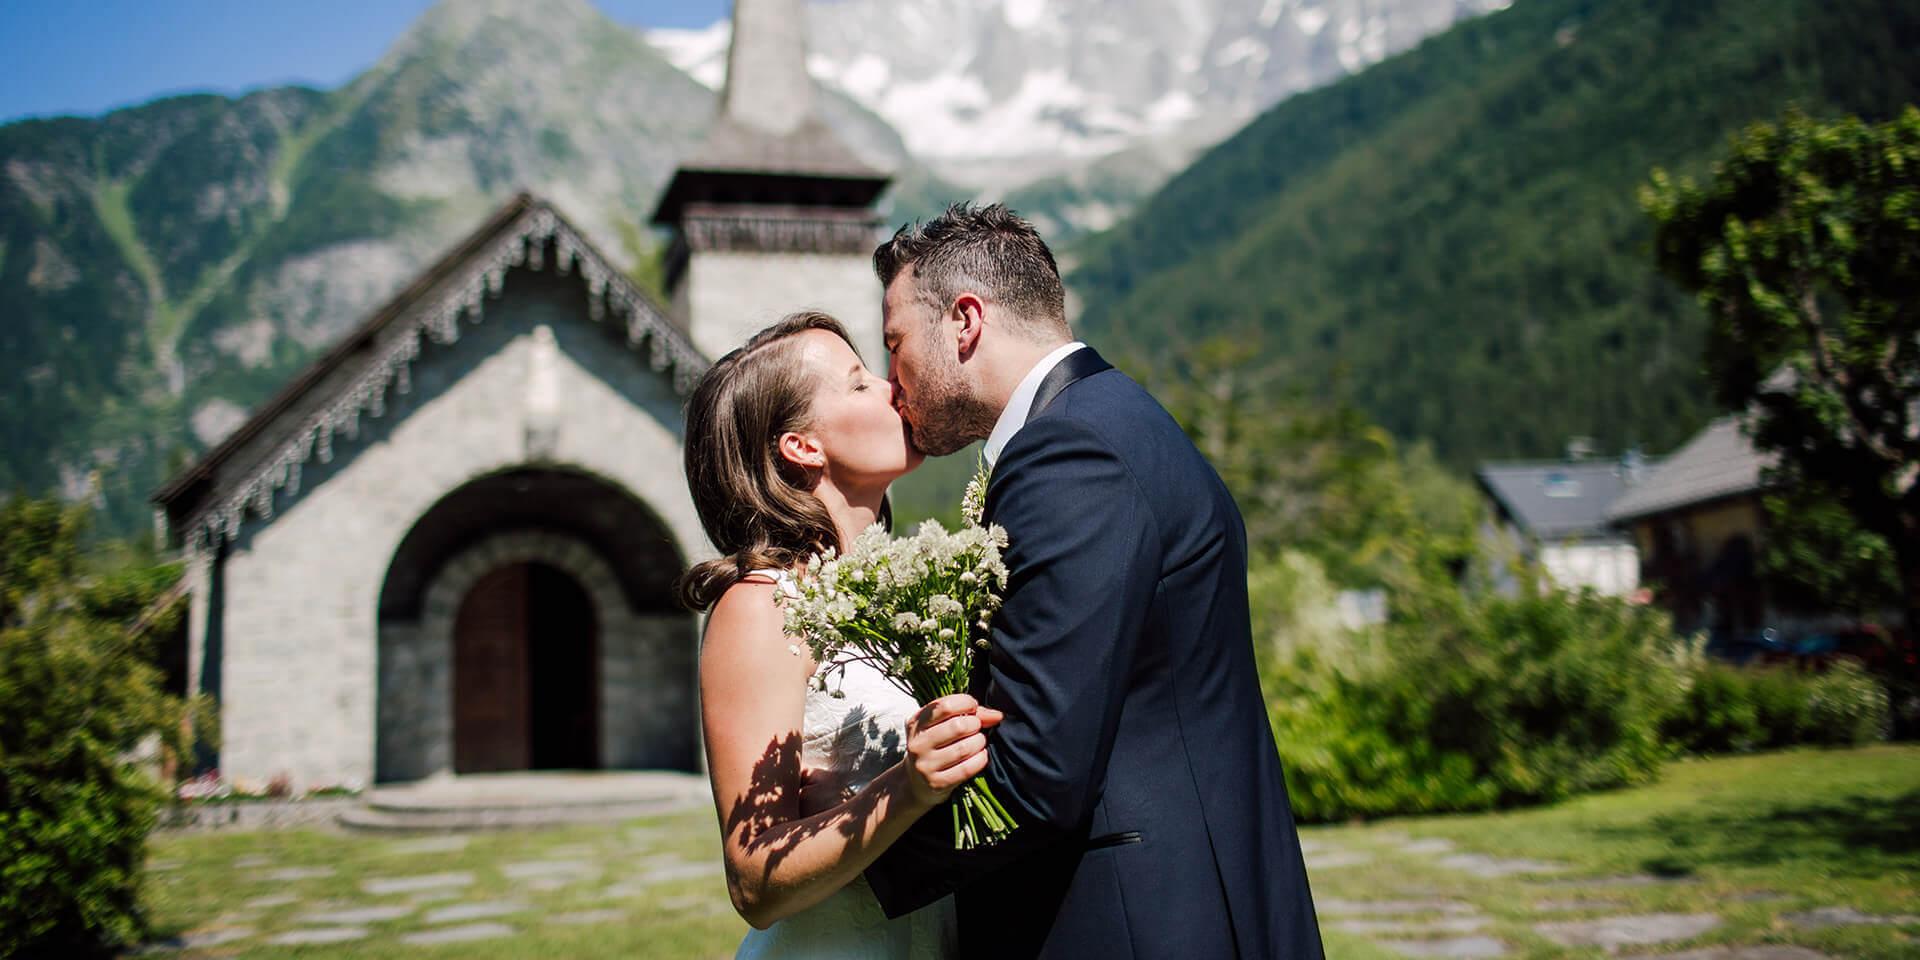 intimate destination wedding in chamonix french alps